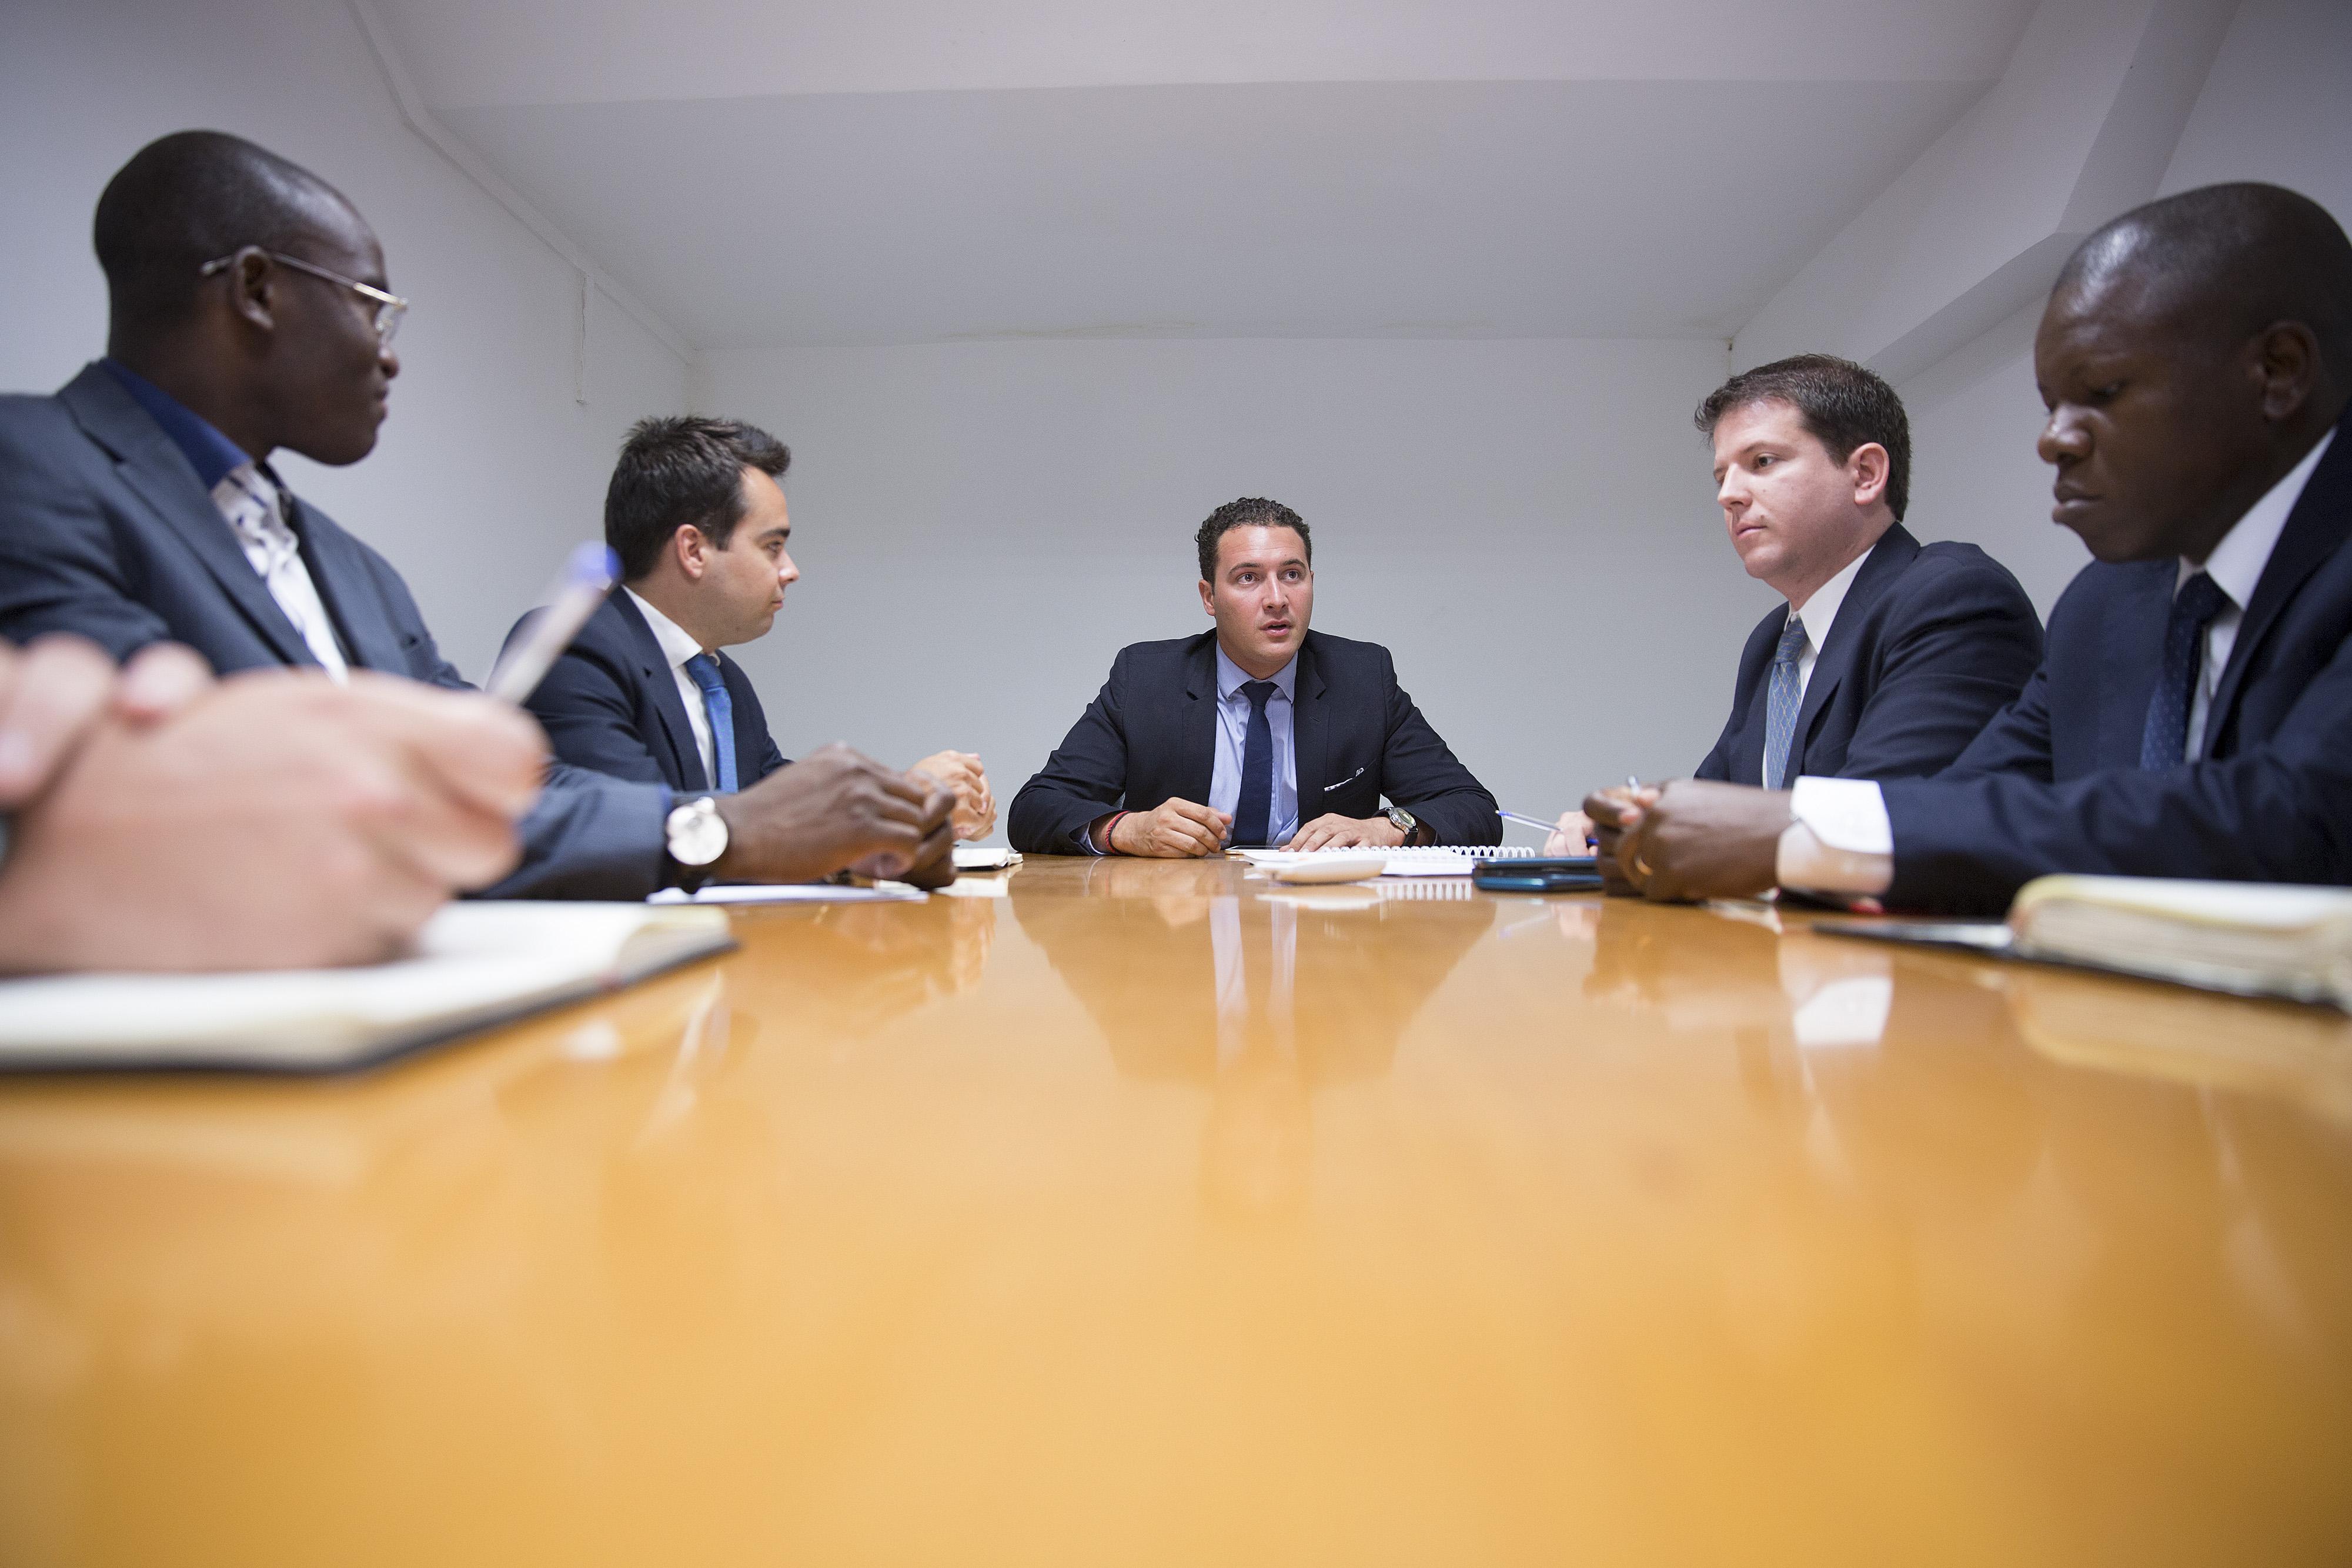 Profile Of Entrepreneur Alexander Thomson-Payan Chief Executive Officer Of Thomson Group International Ltd